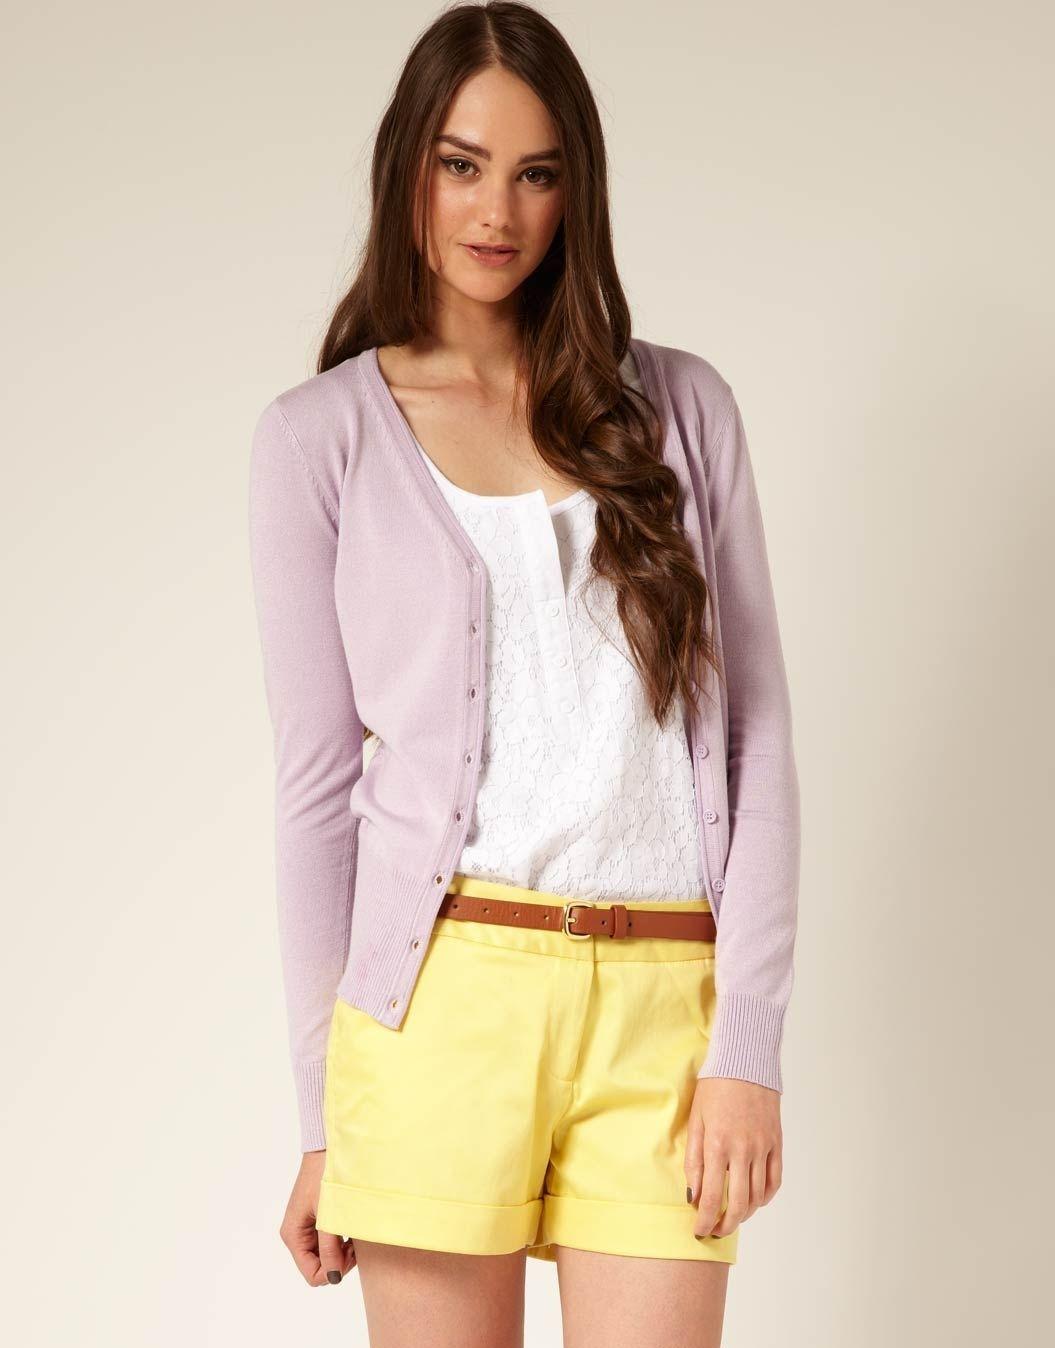 GLASSONS Button Up Cardi Fair Orchard $24.29 | Fashion ...